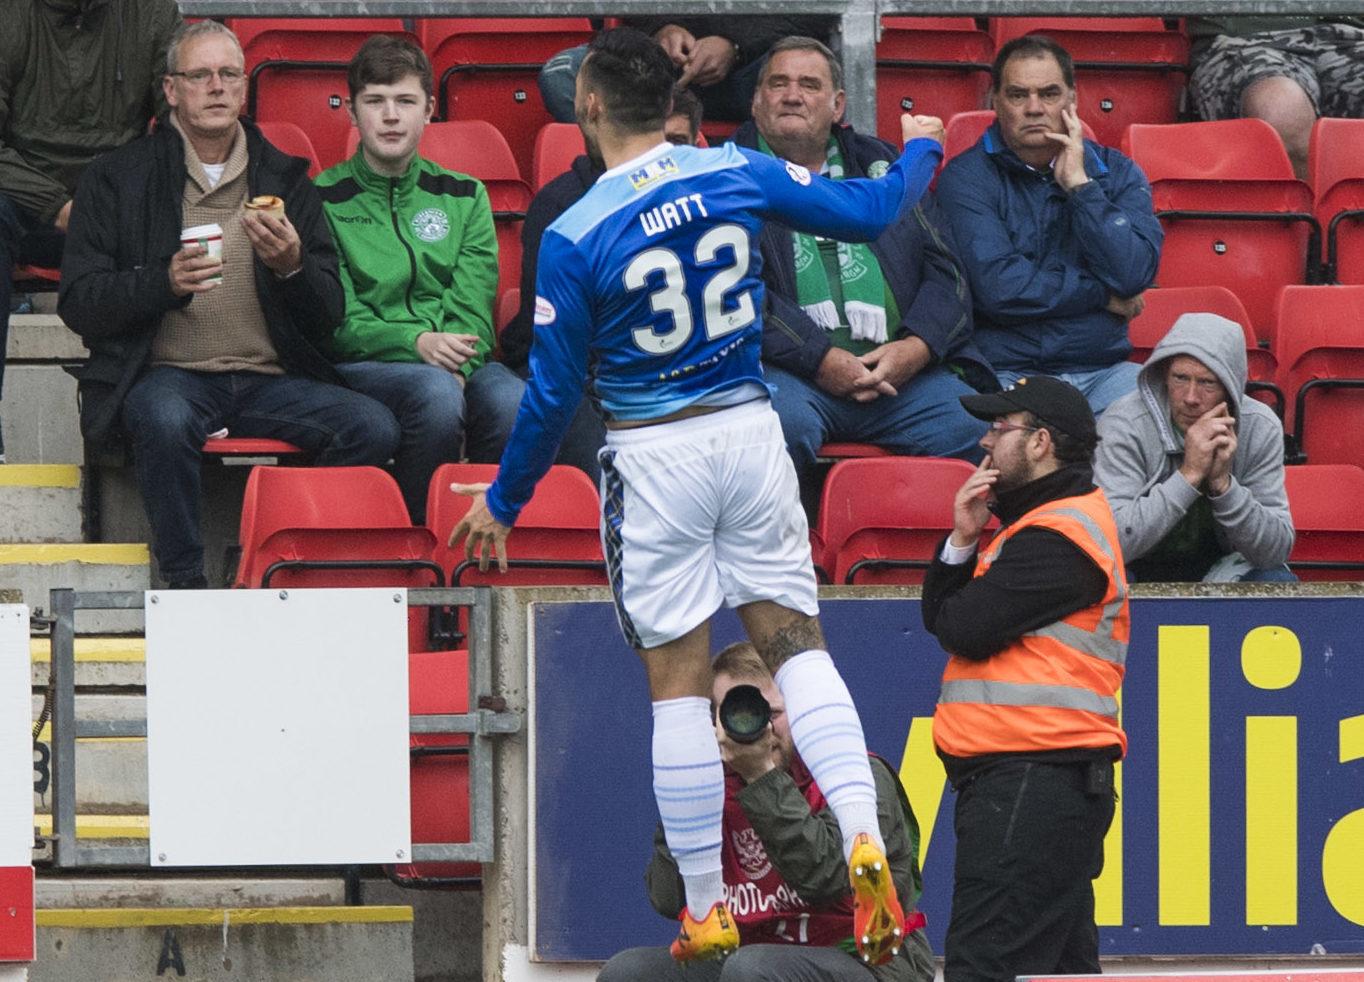 Tony Watt celebrates his goal.